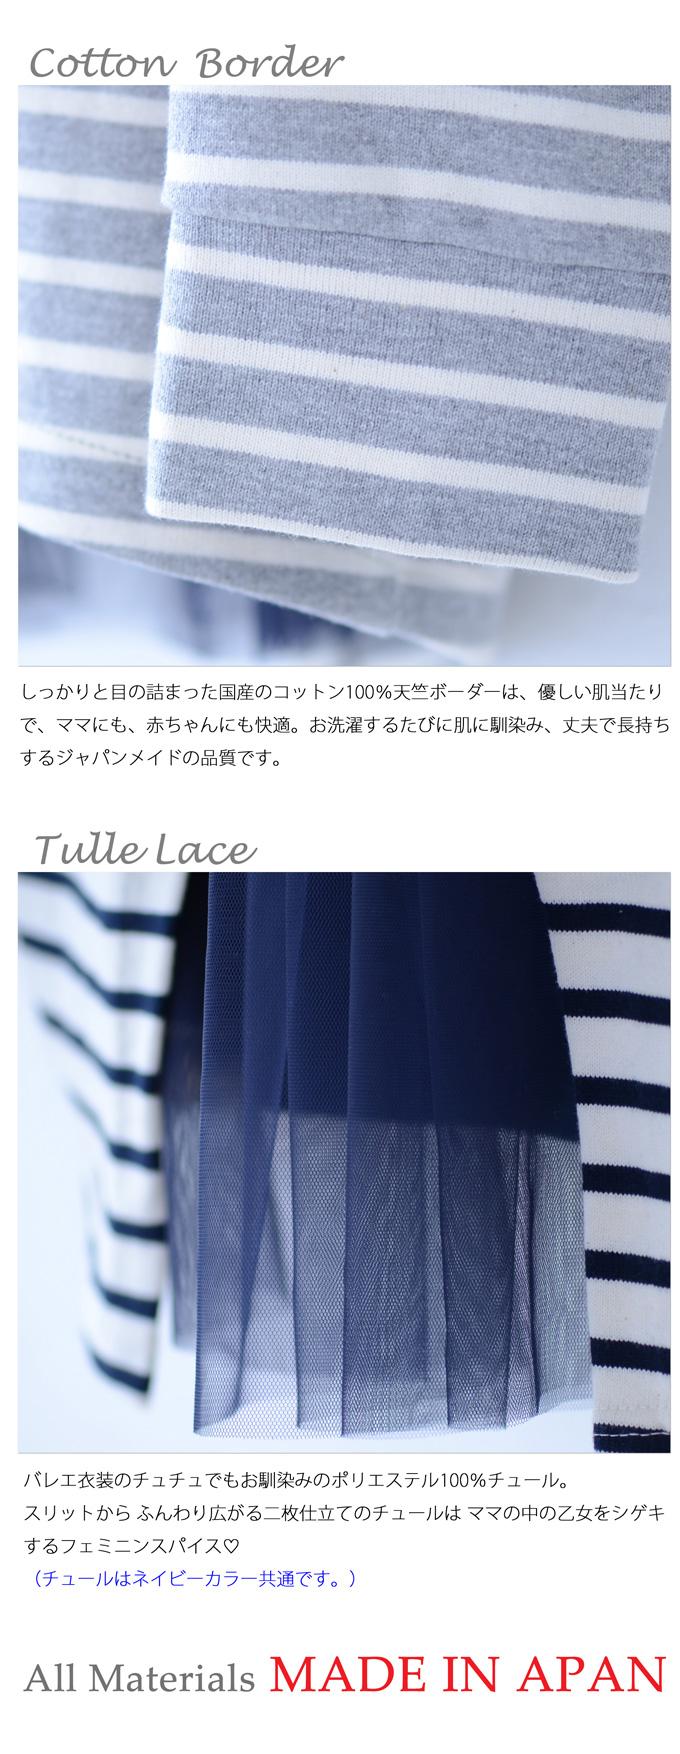 PC貼付け_上_3